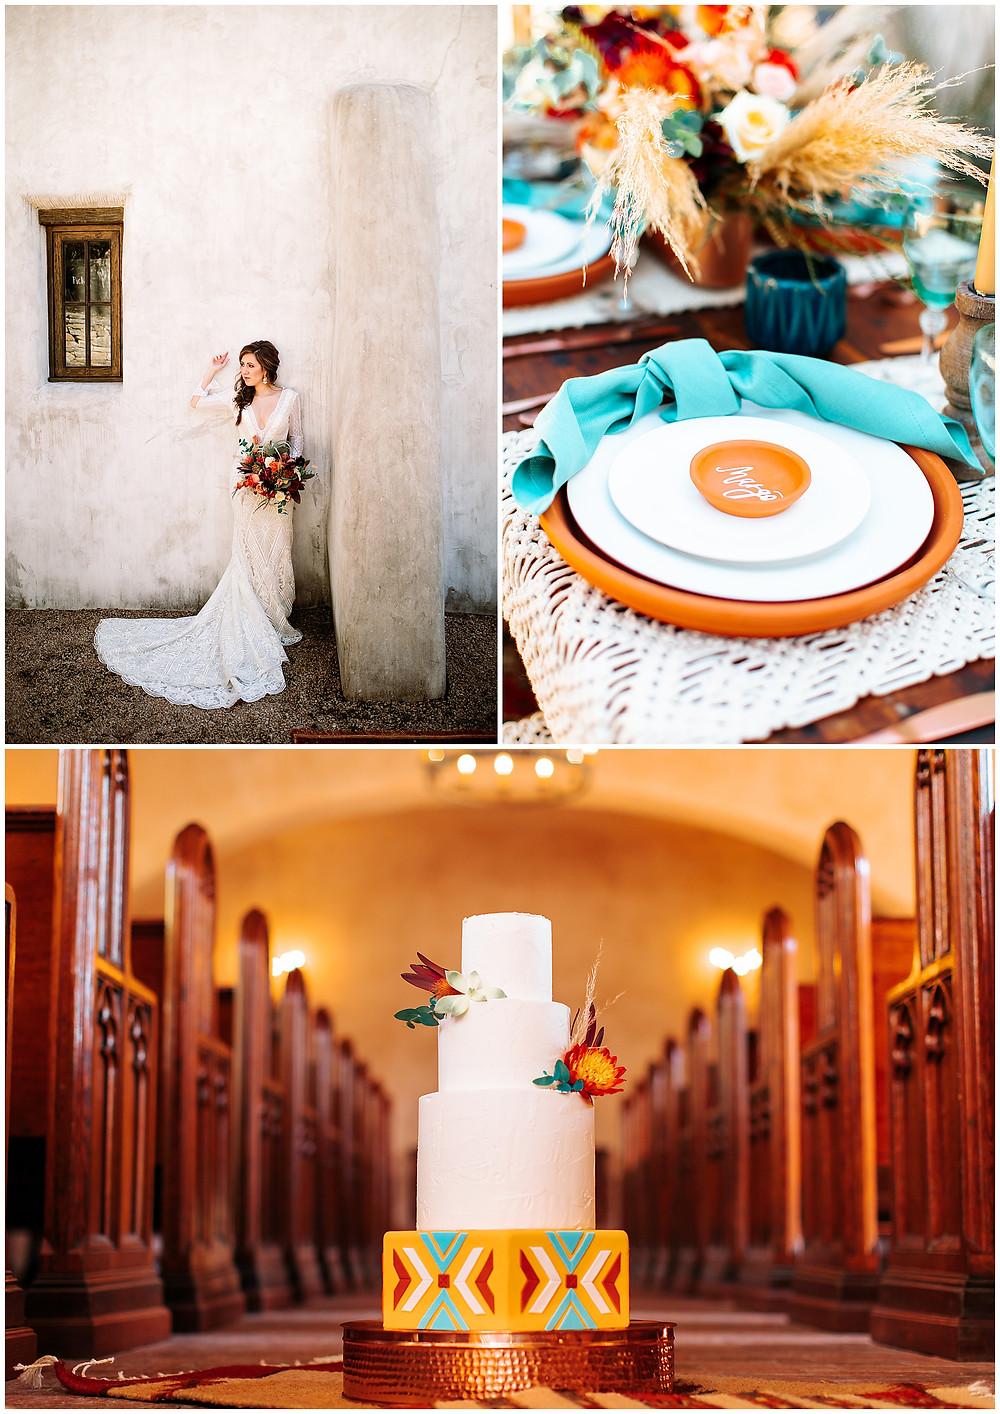 snap chic photography, southwest styled shoot, Texas hill country wedding photographer, Boerne Texas weddings, Wedding Cake